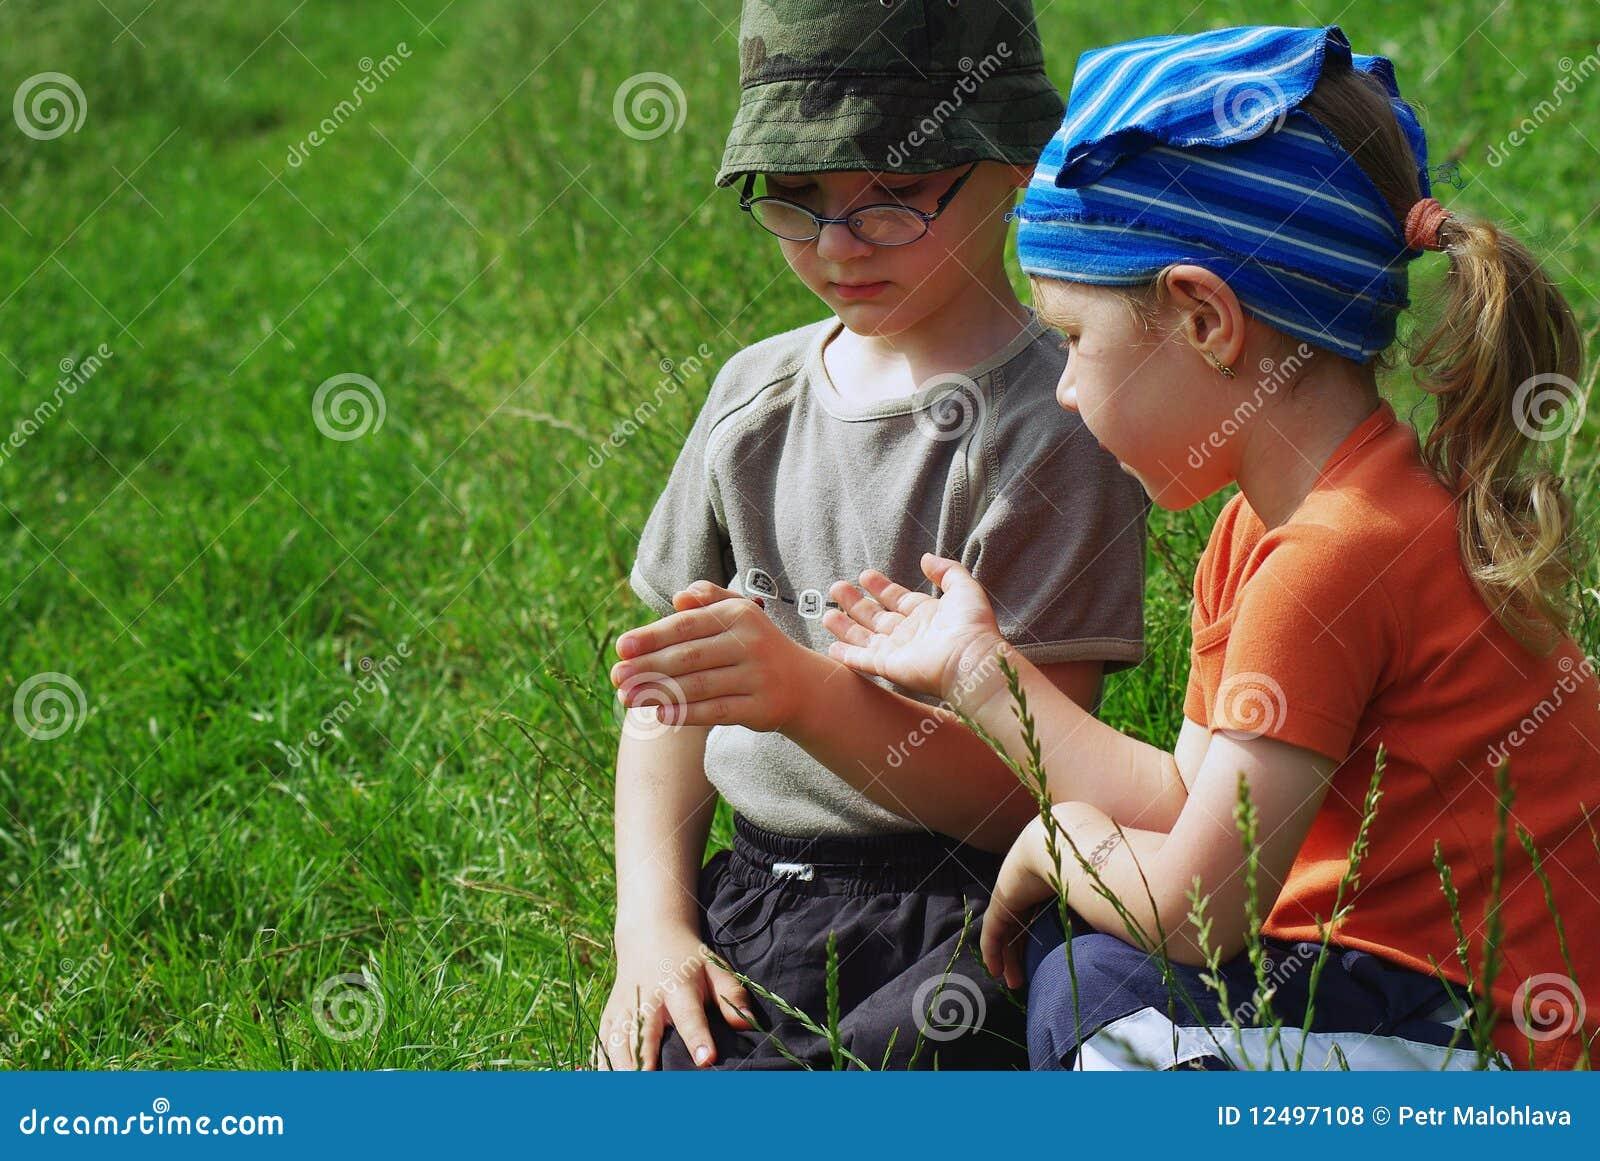 Children with bug